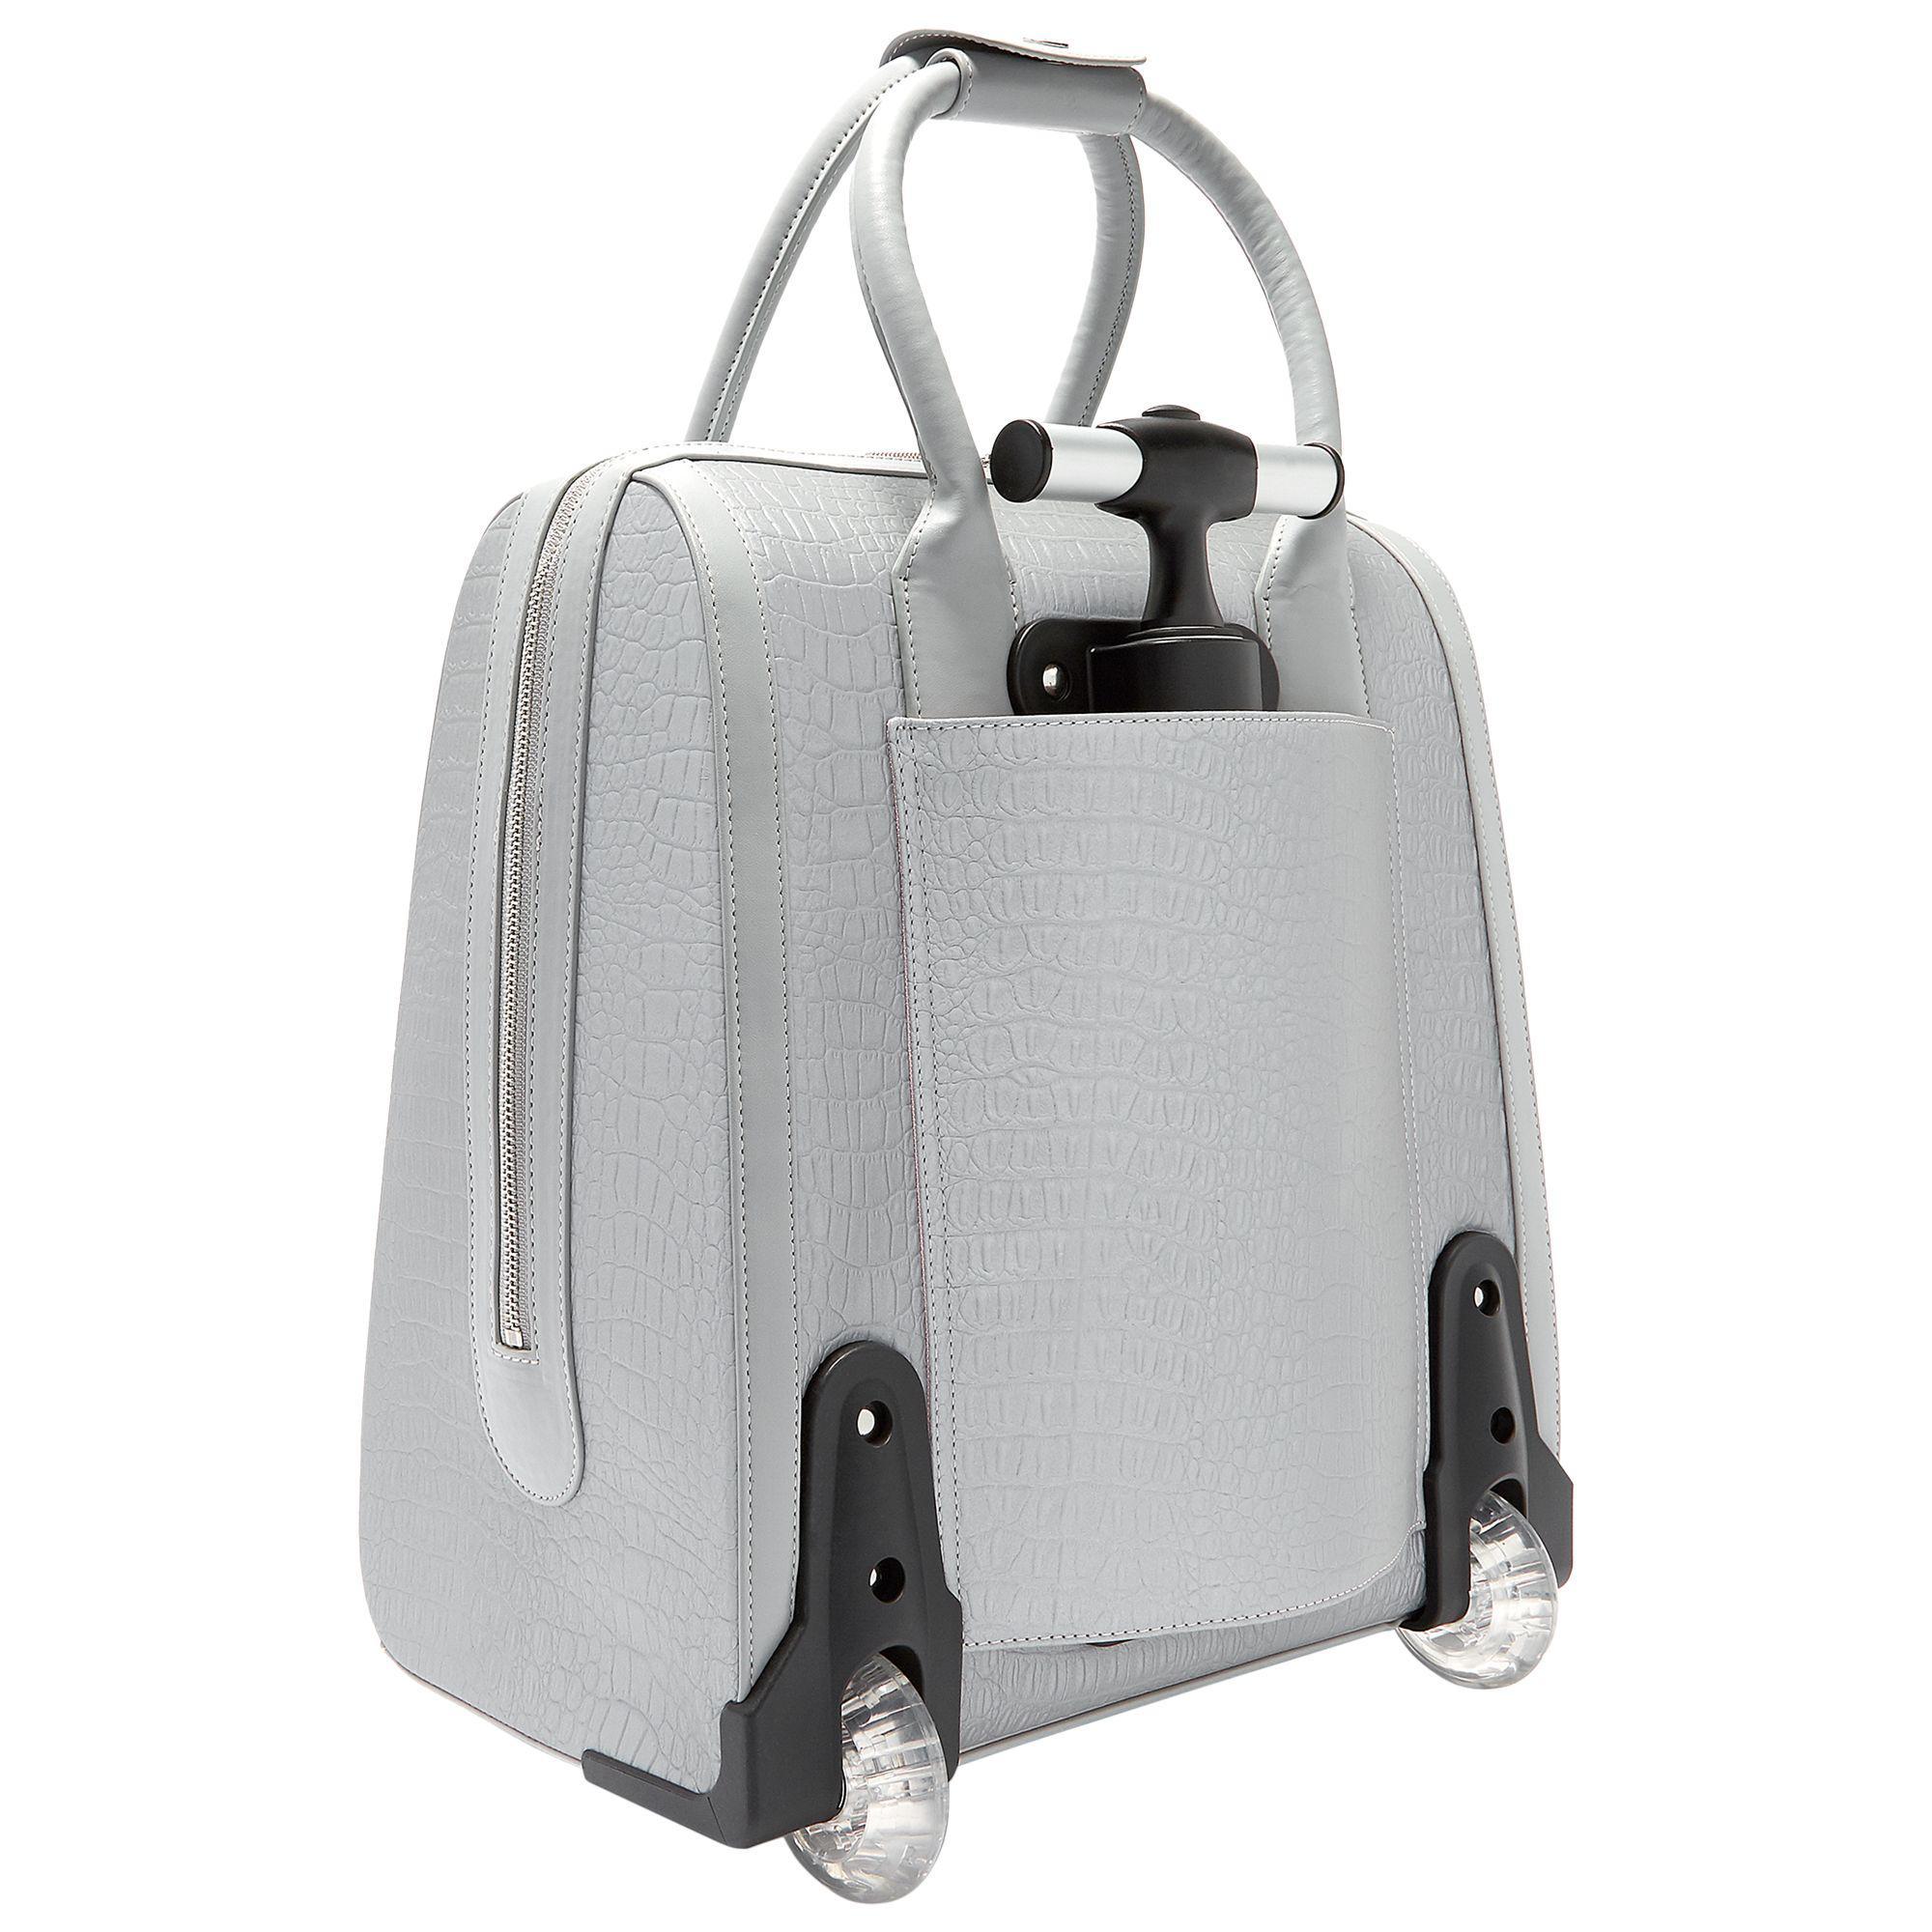 c7d5823a3e3752 Ted Baker Cressa Textured Travel Bag in Metallic - Lyst